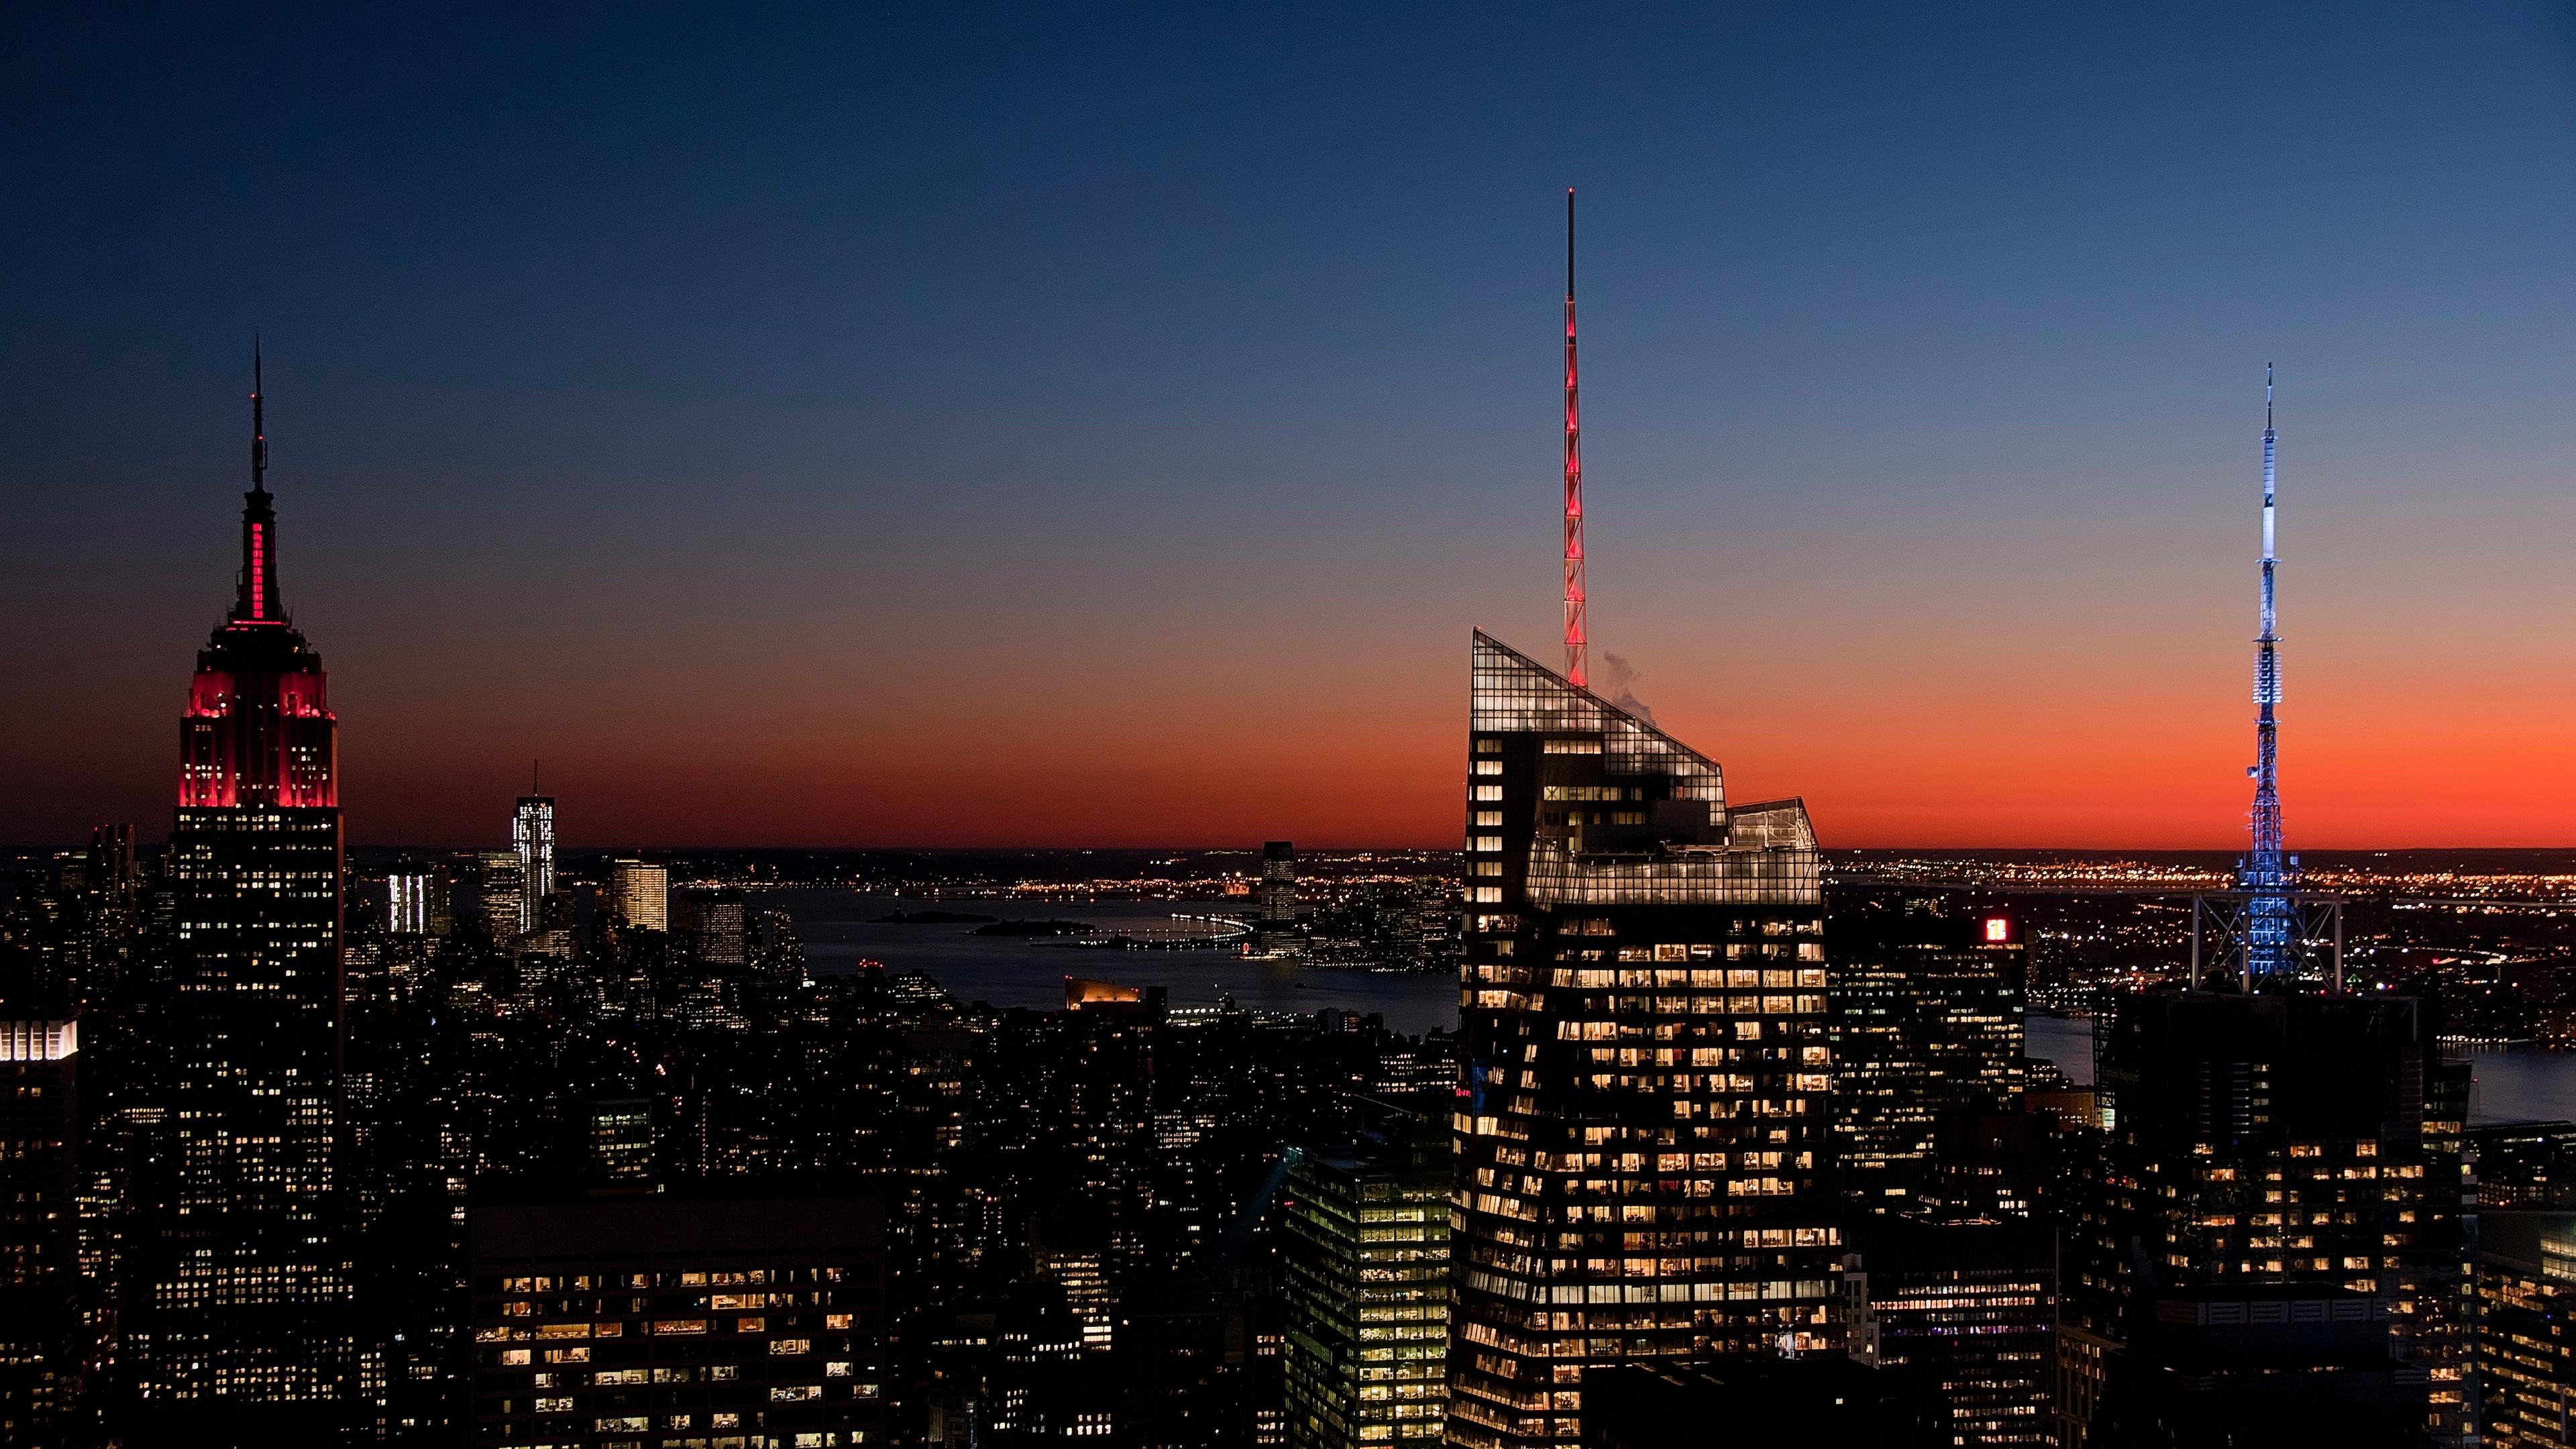 new york usa night skyscrapers 4k 1538068455 - new york, usa, night, skyscrapers 4k - USA, Night, new york